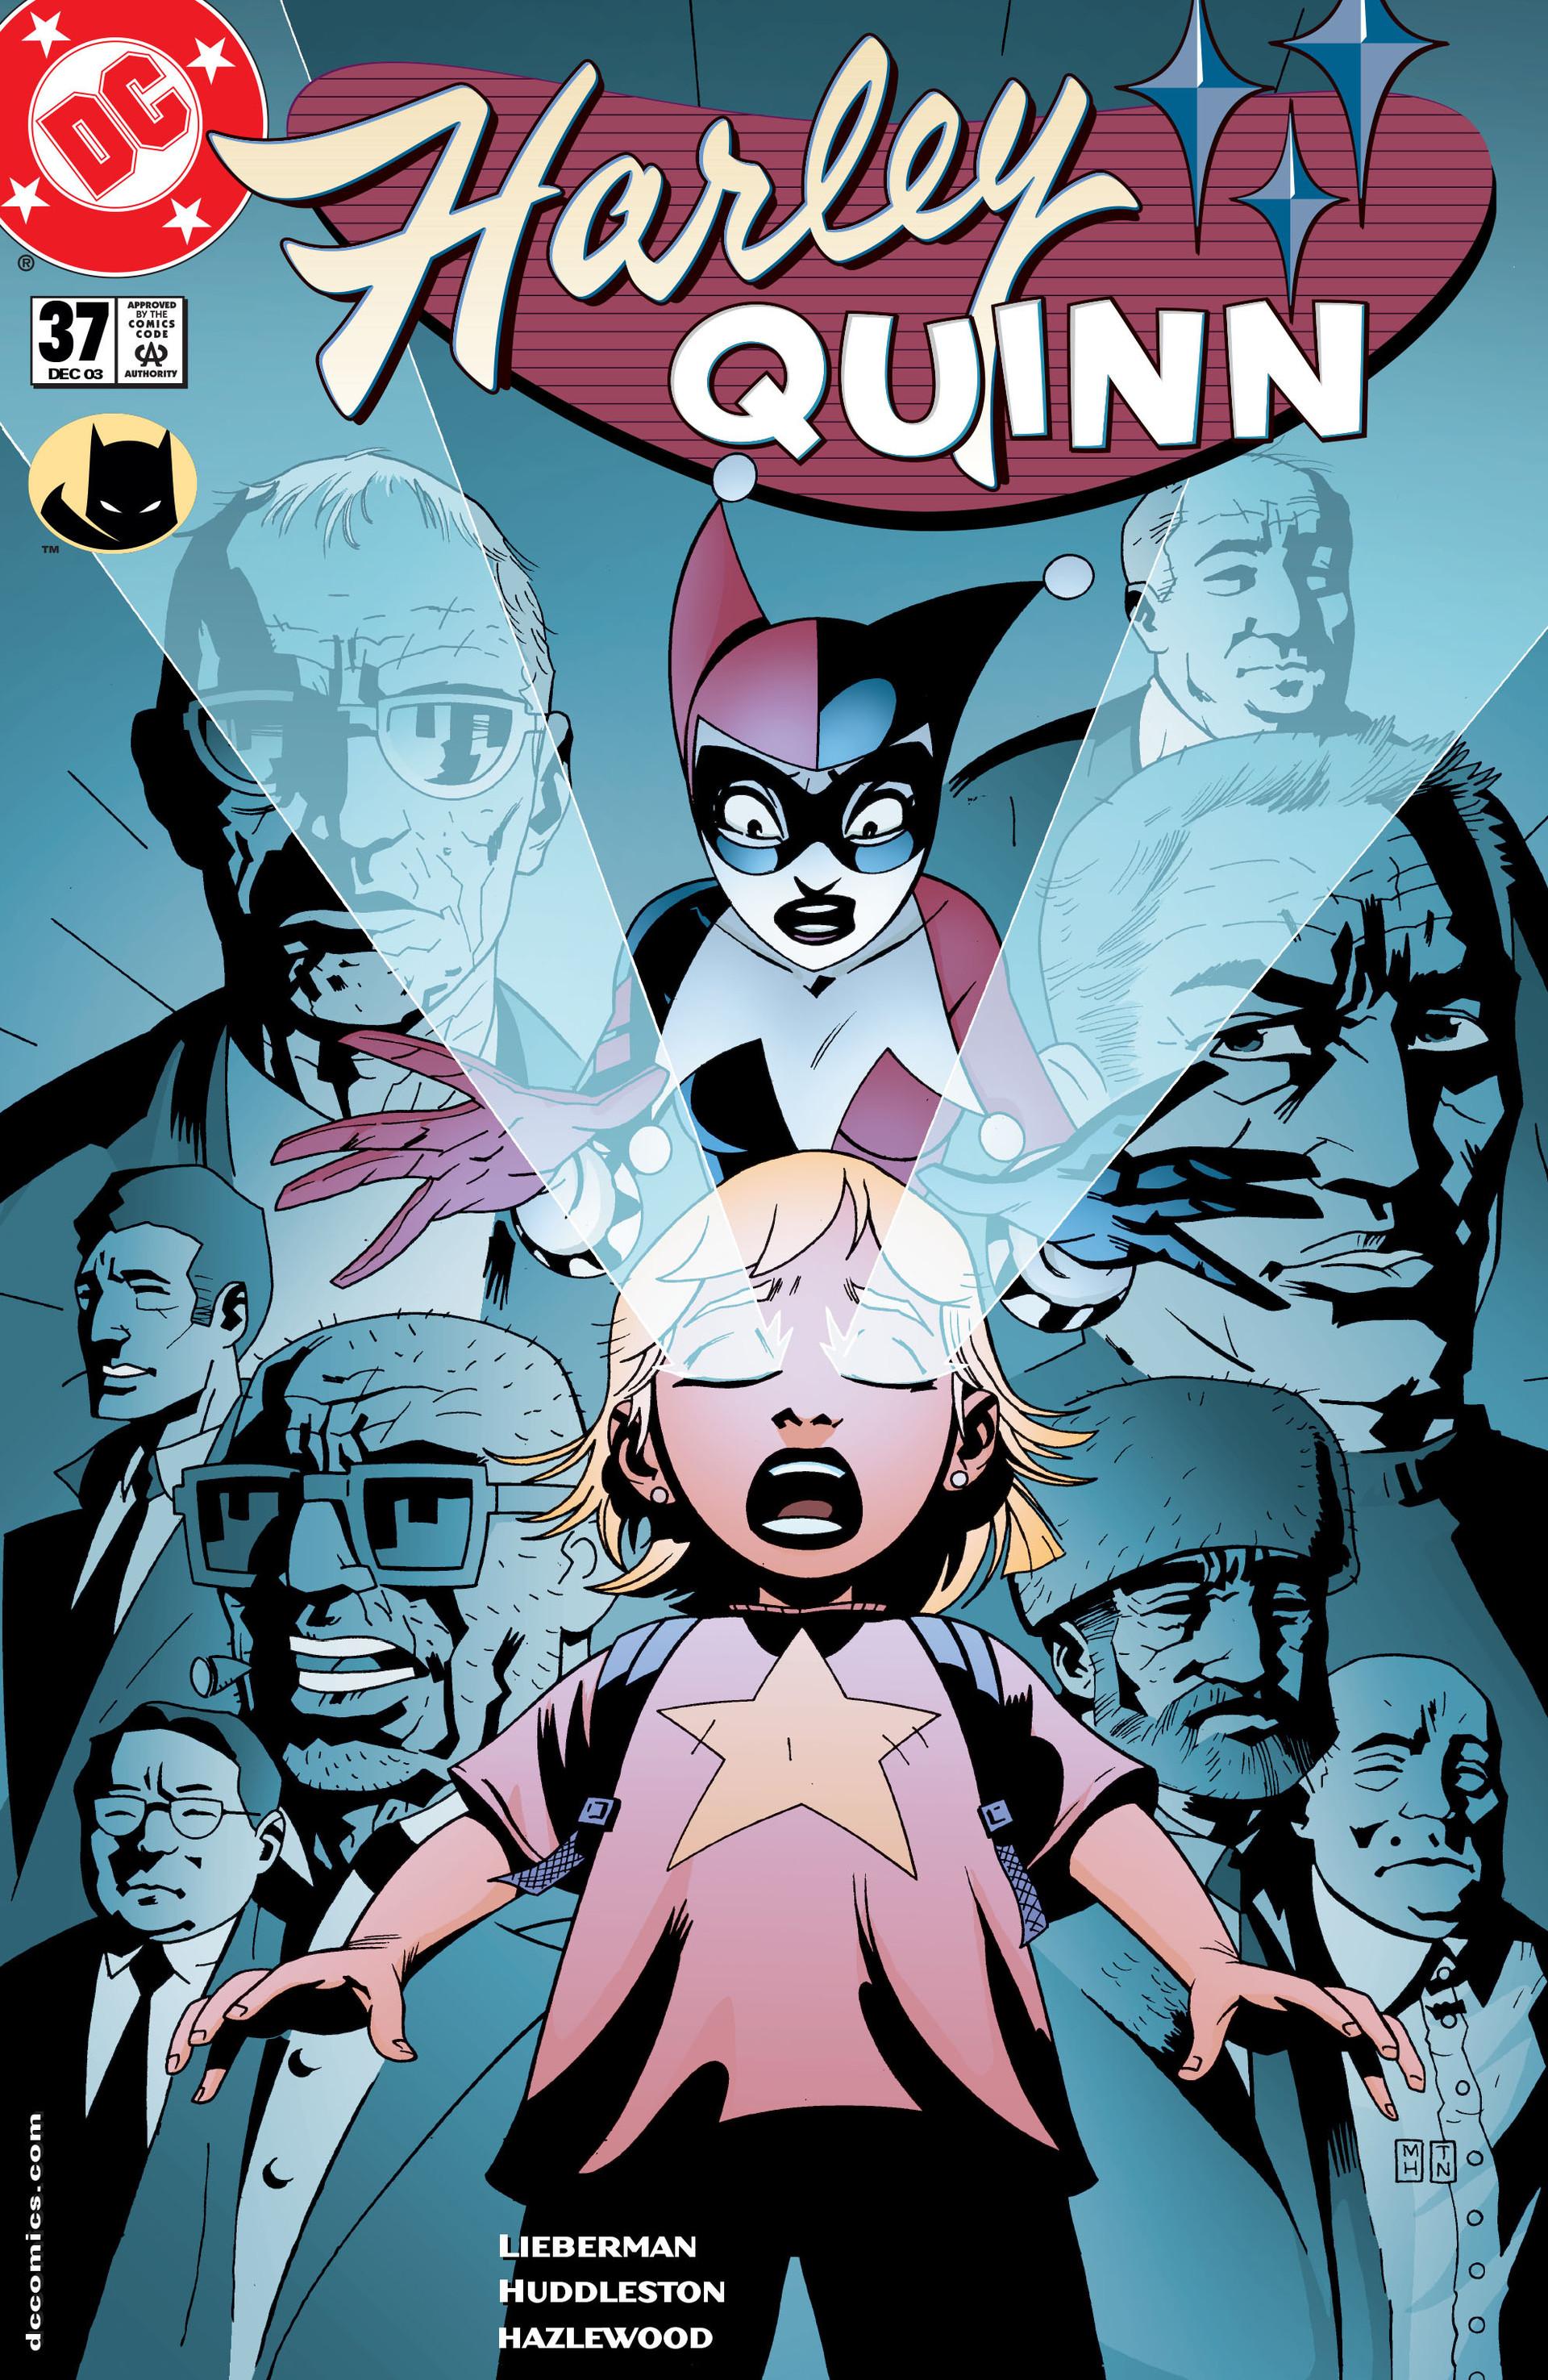 Harley Quinn Vol.1 #37